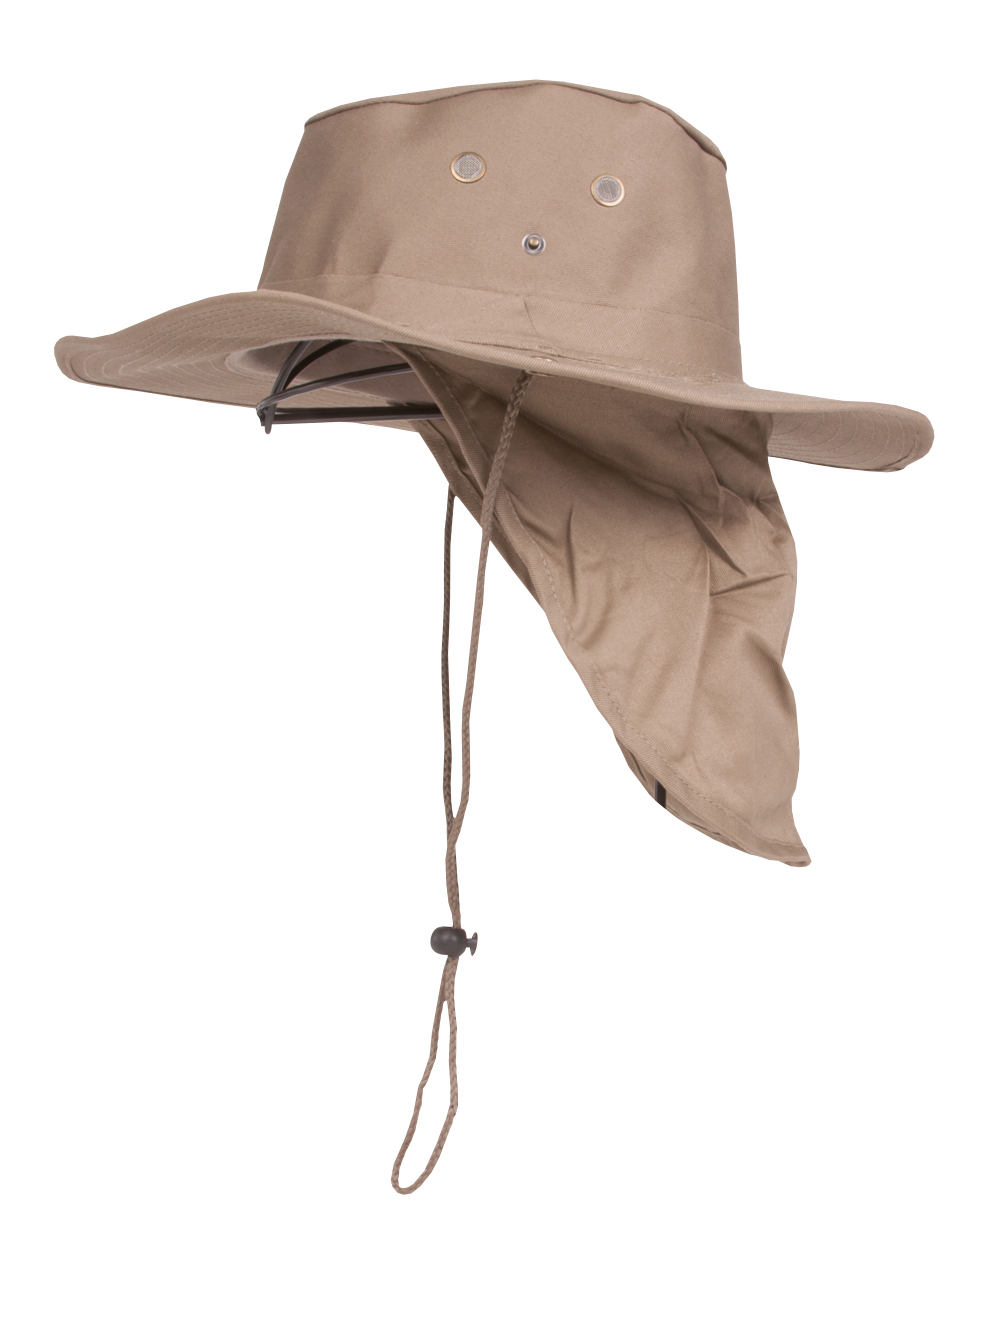 Top Headwear Safari Explorer Bucket Hat With Flap Neck Cover - Khaki -  Walmart.com 2c28ab0820f